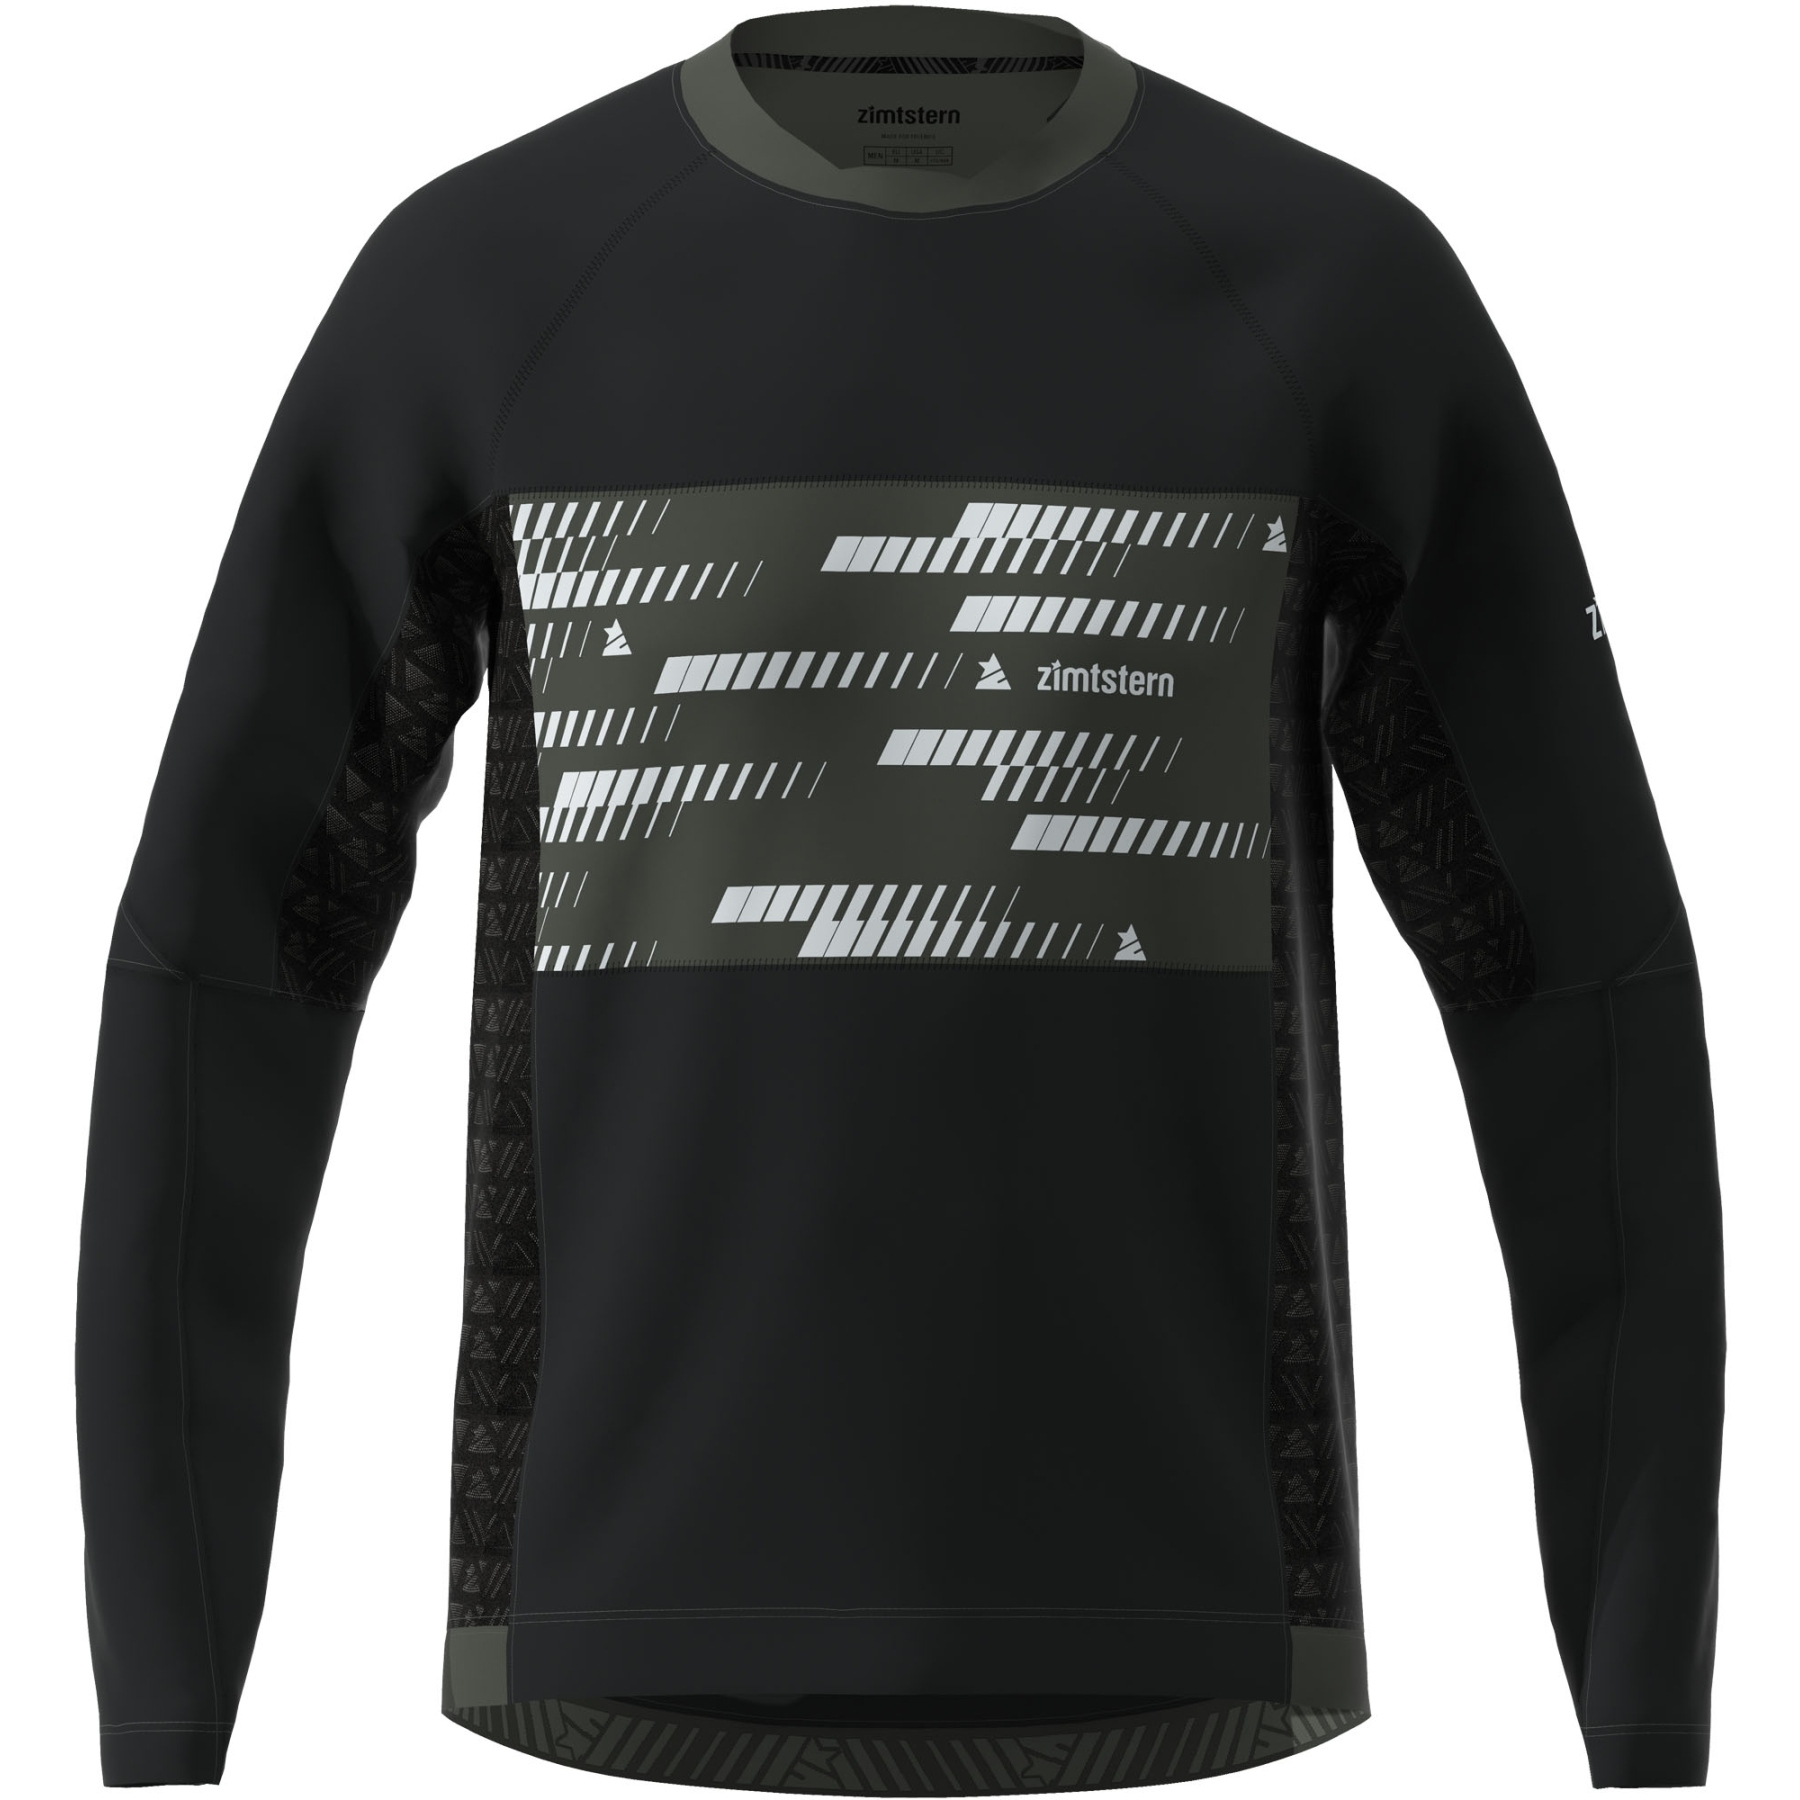 Zimtstern TechZonez Langarm-Shirt - pirate black/gun metal